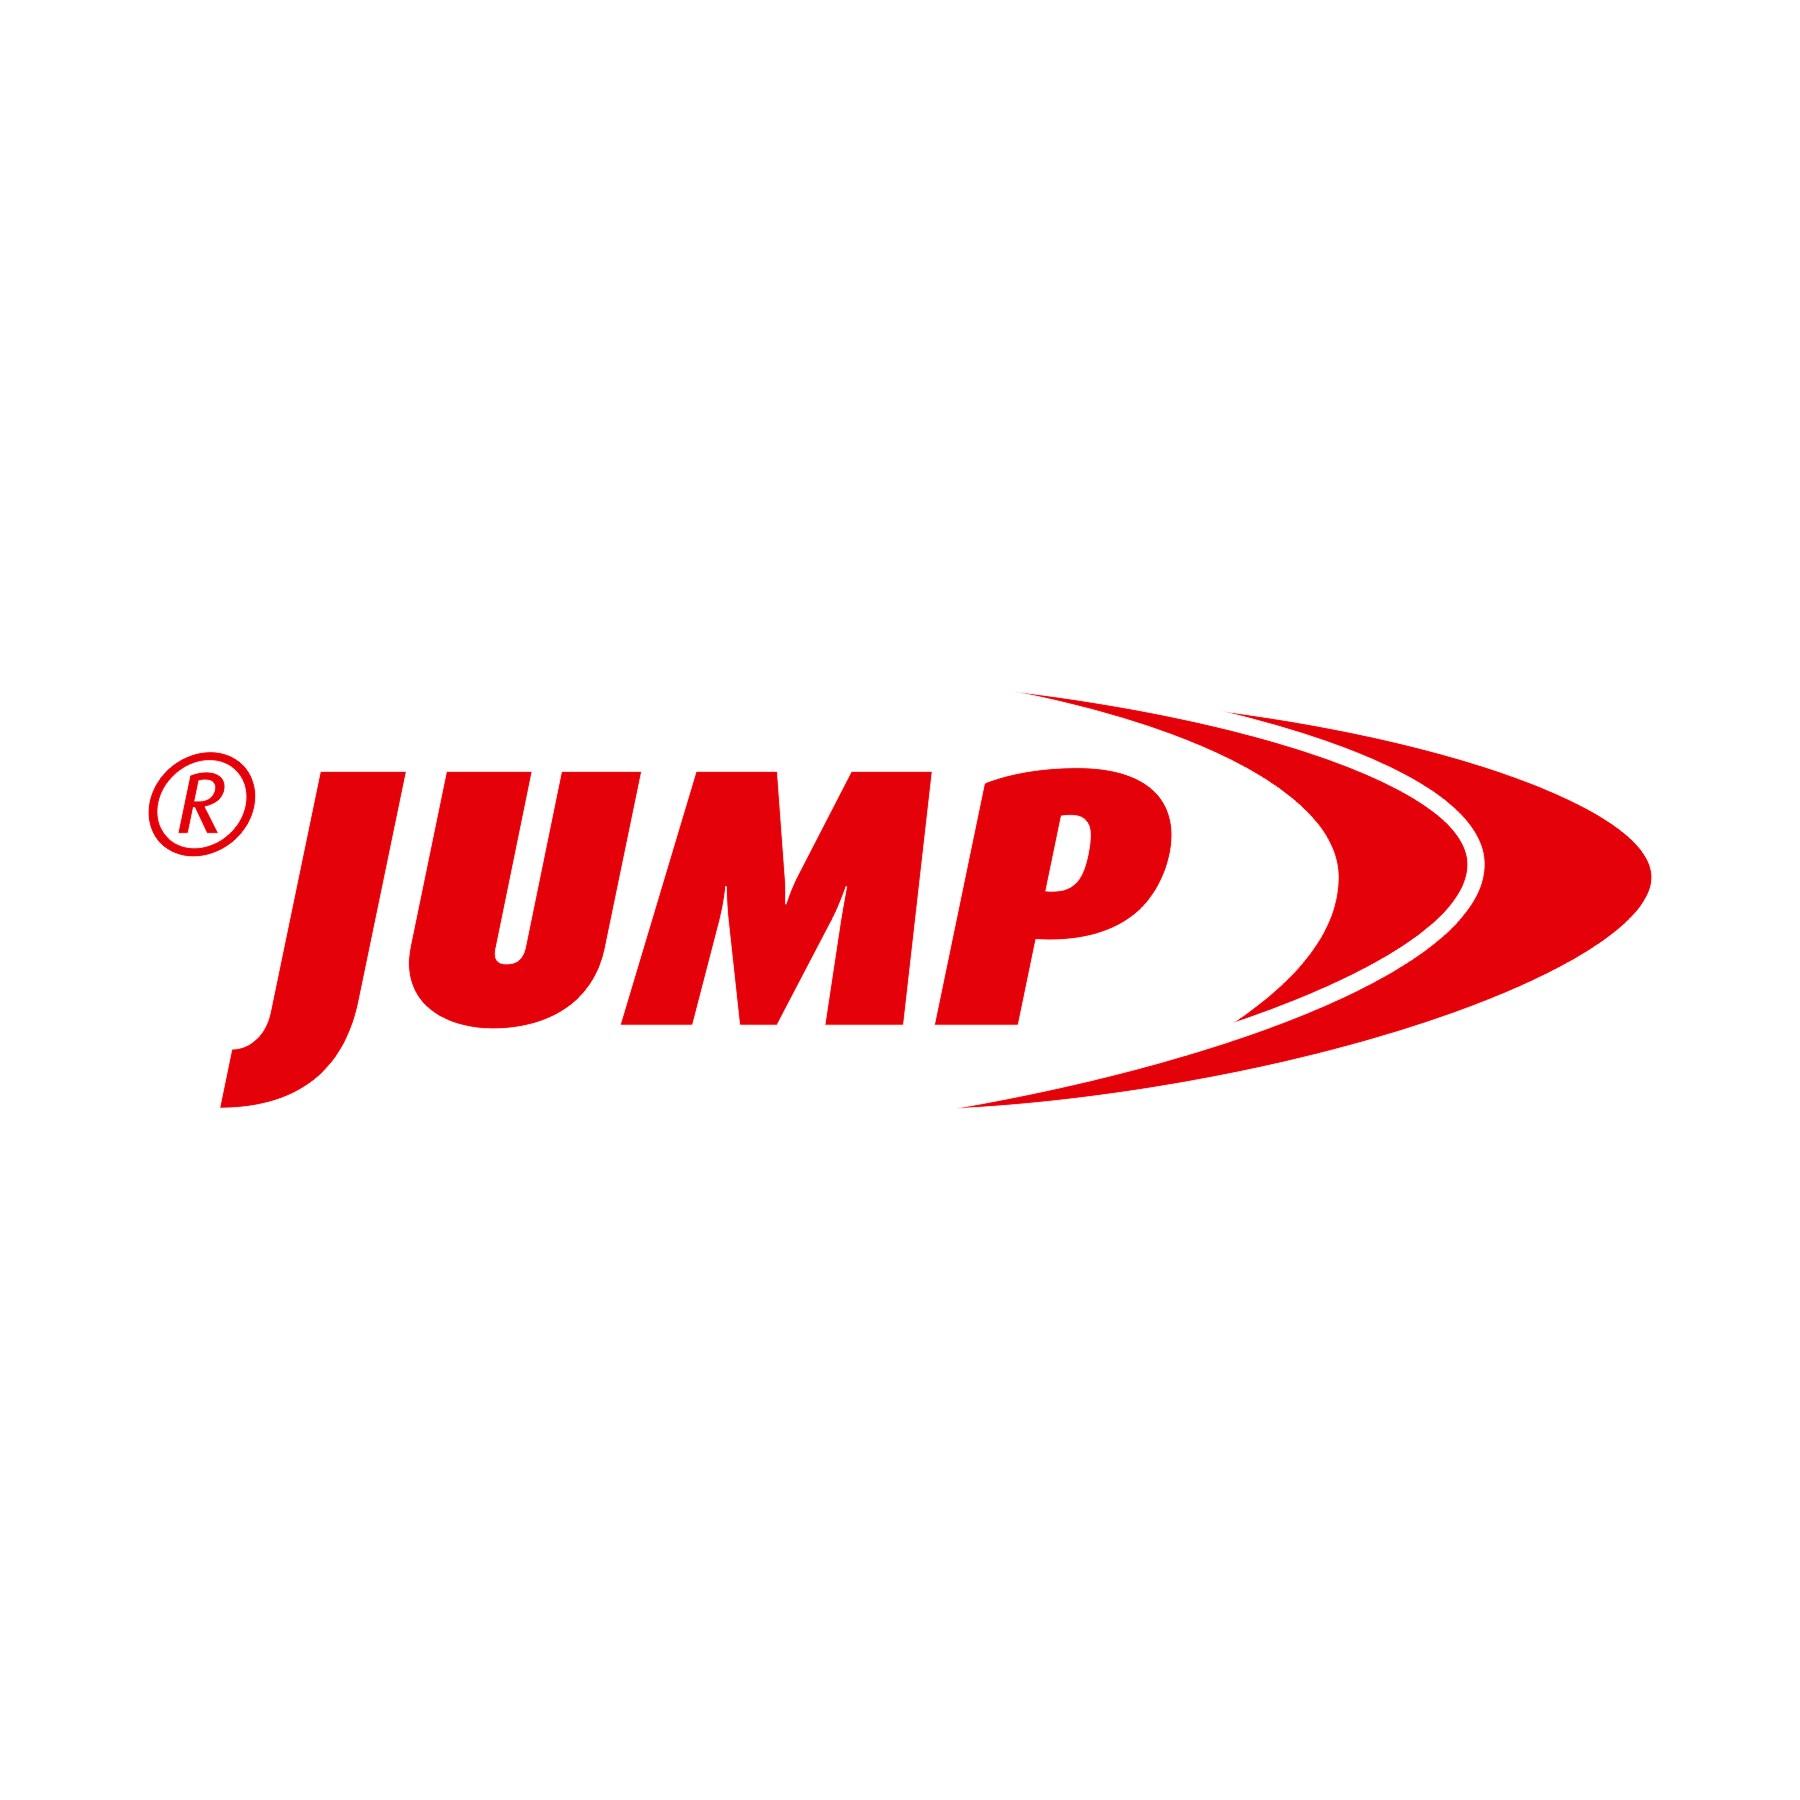 Jump logo design